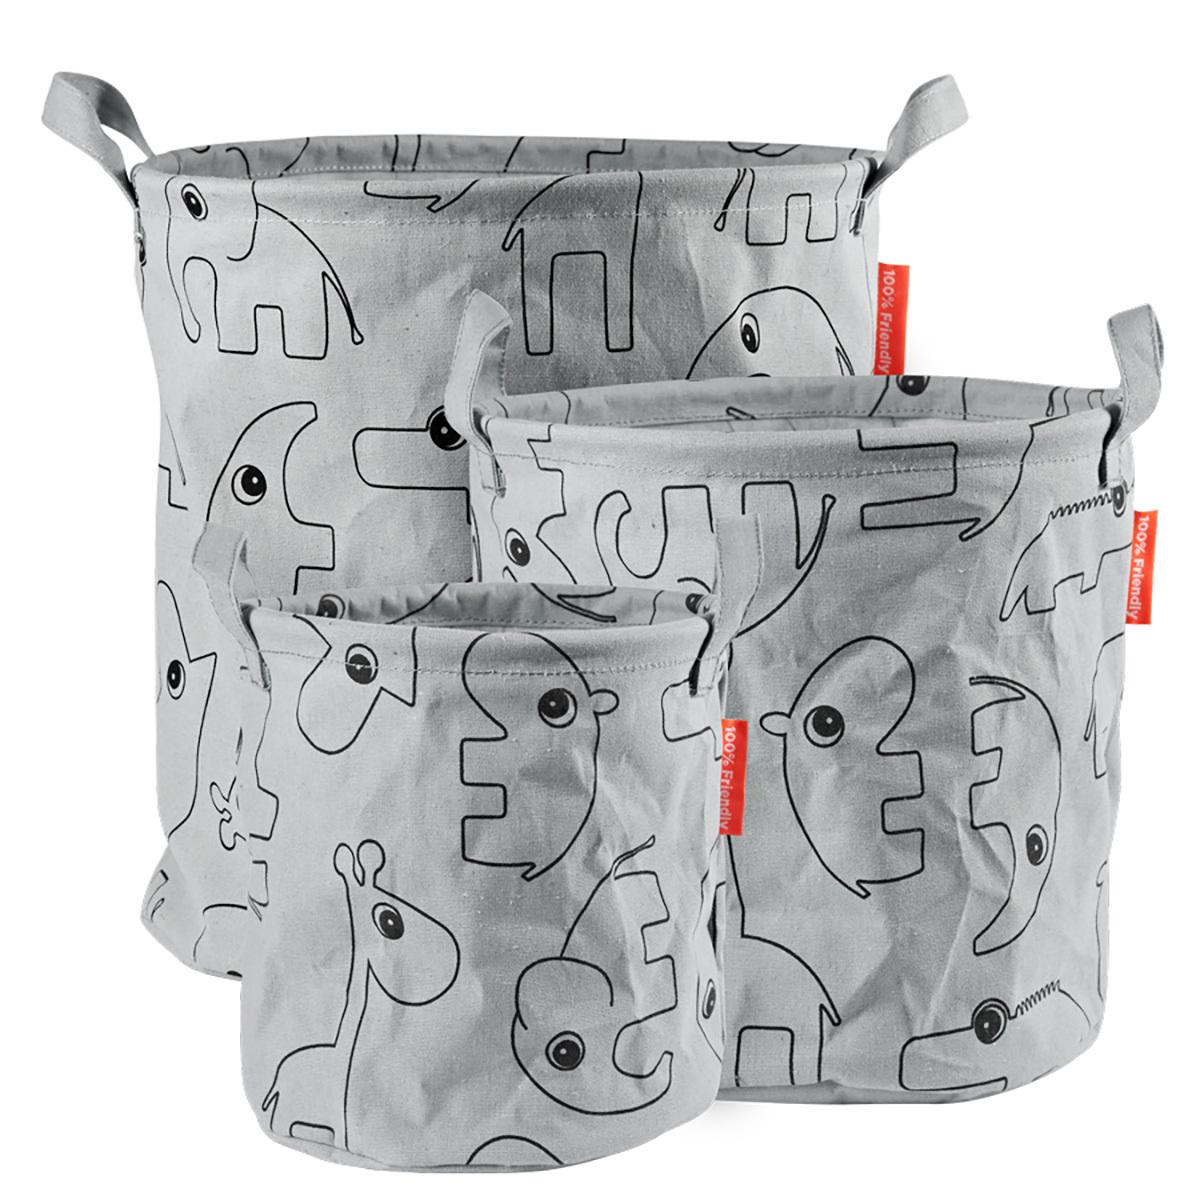 Panier & corbeille Pack de 3 Paniers de Rangement Contour - Gris Pack de 3 Paniers de Rangement Contour - Gris